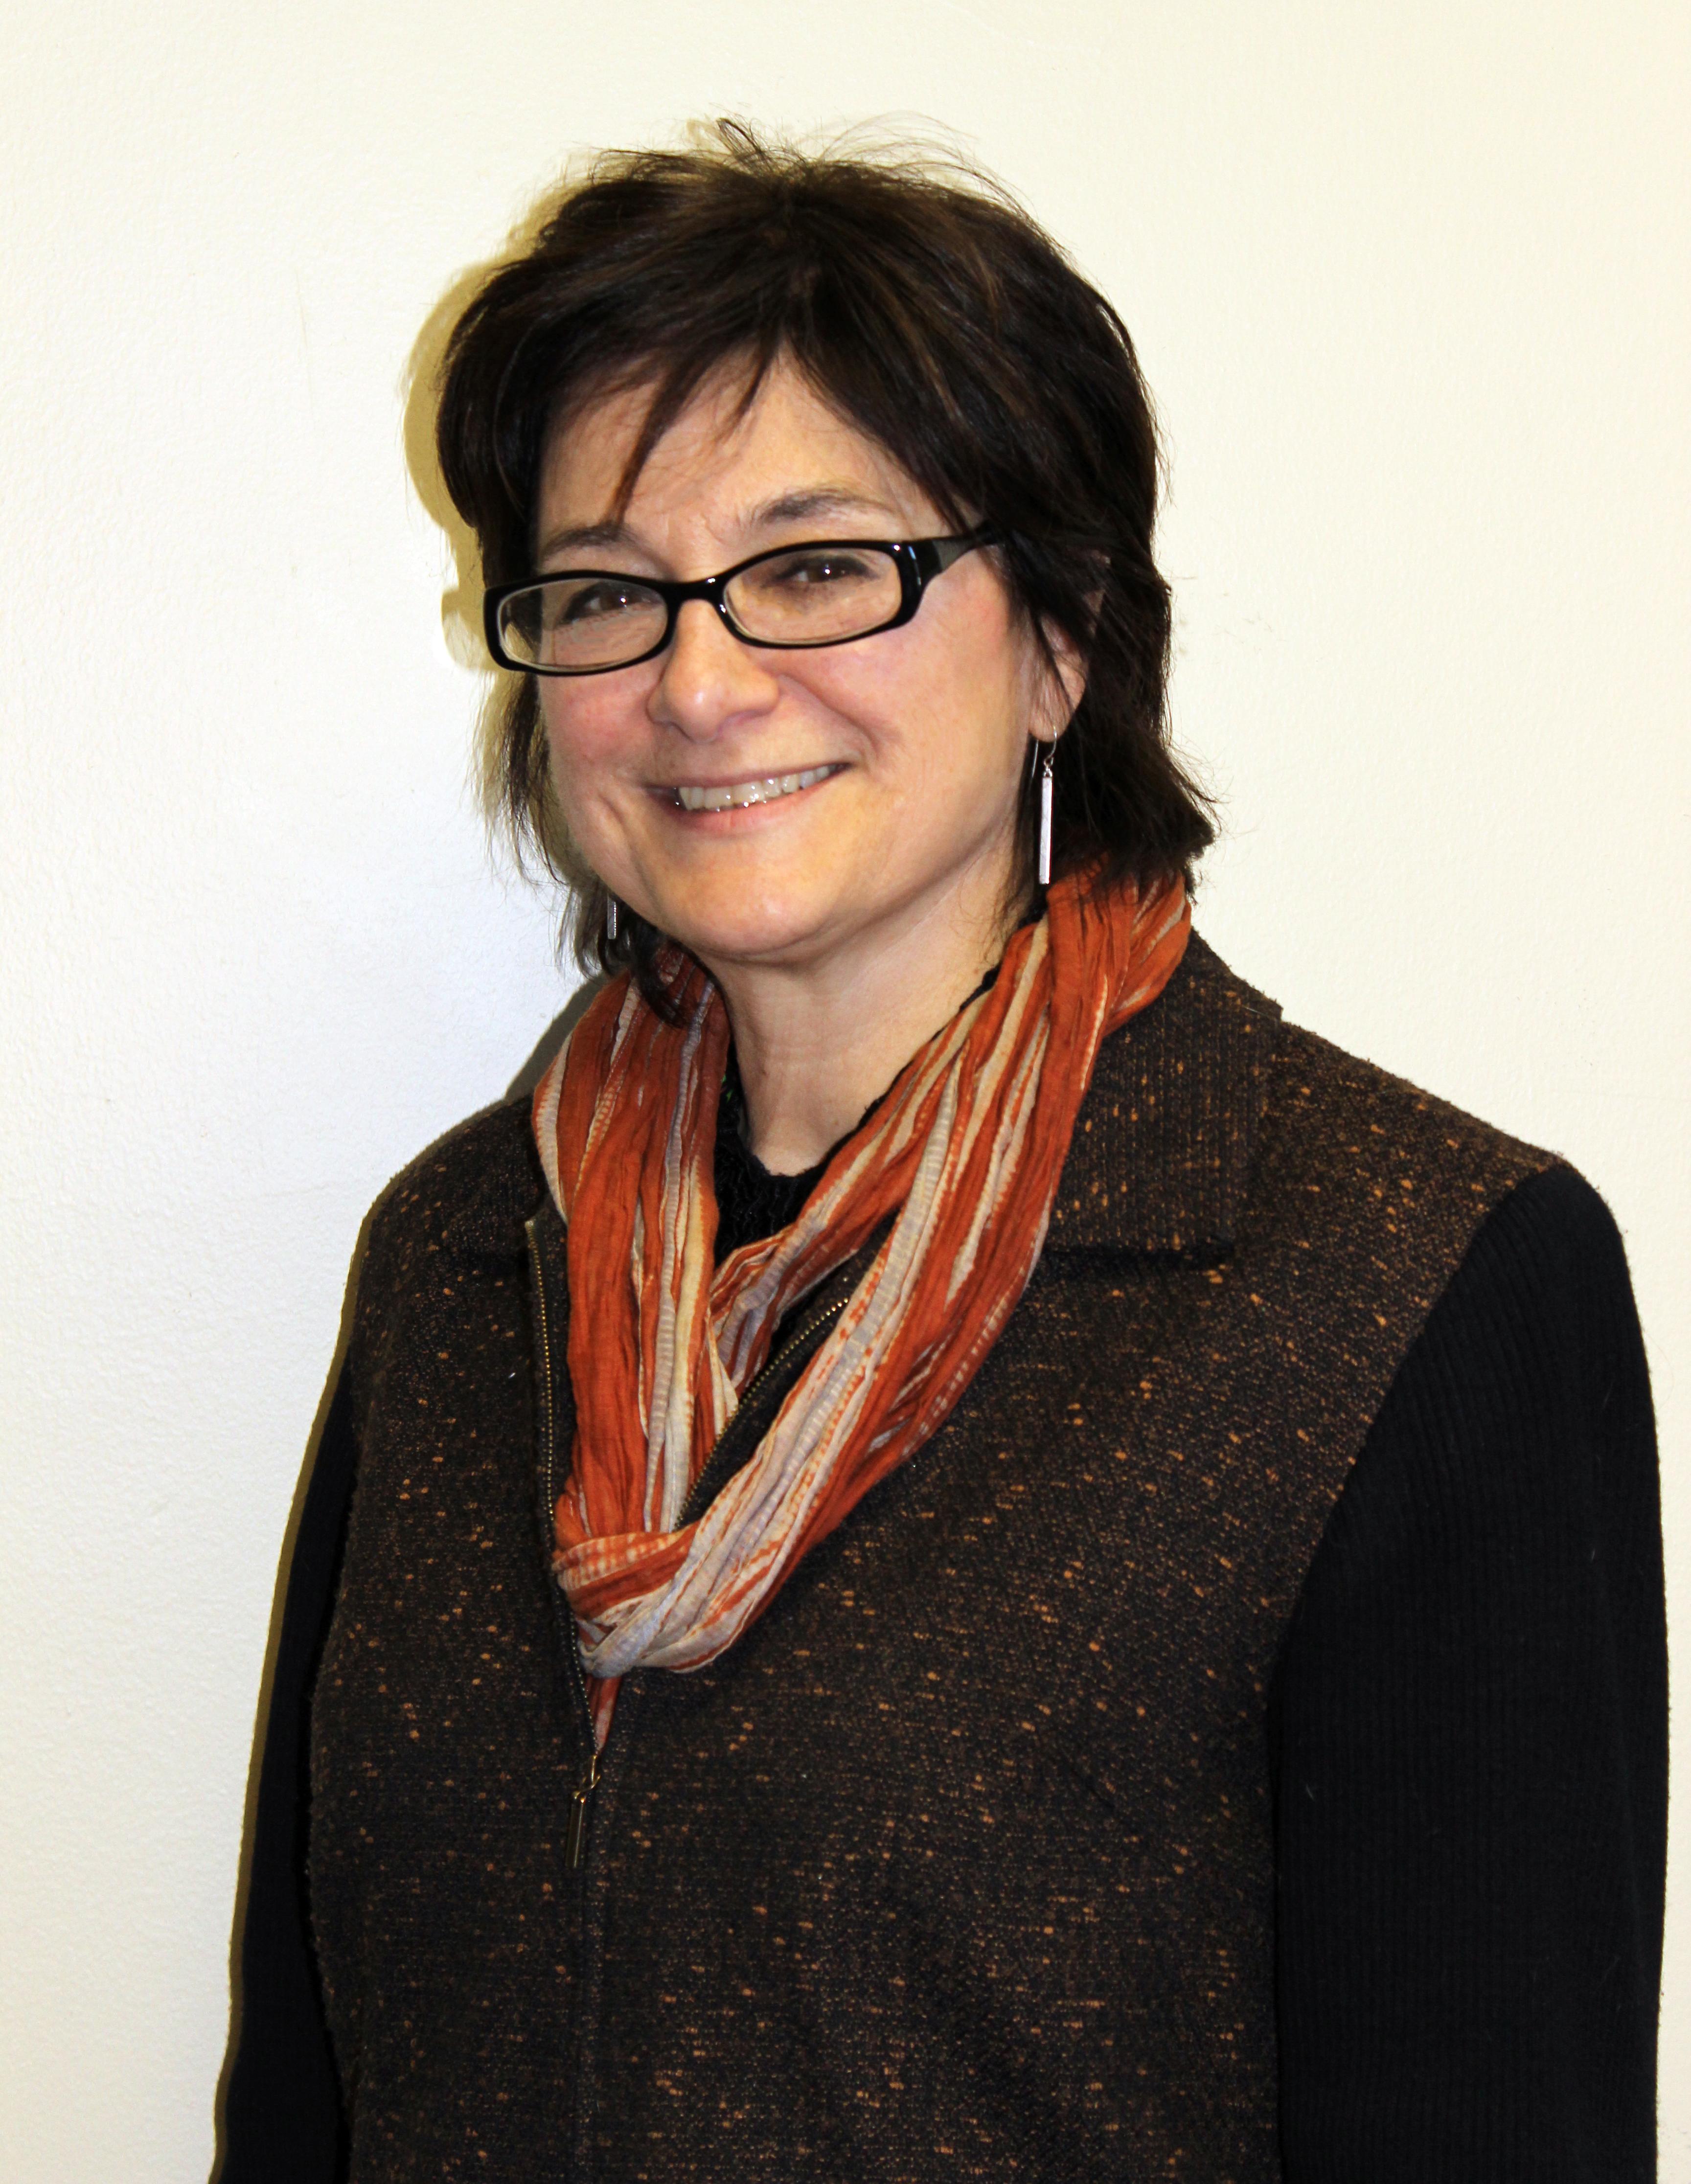 Varricchio Starts as New Putnam EDC President